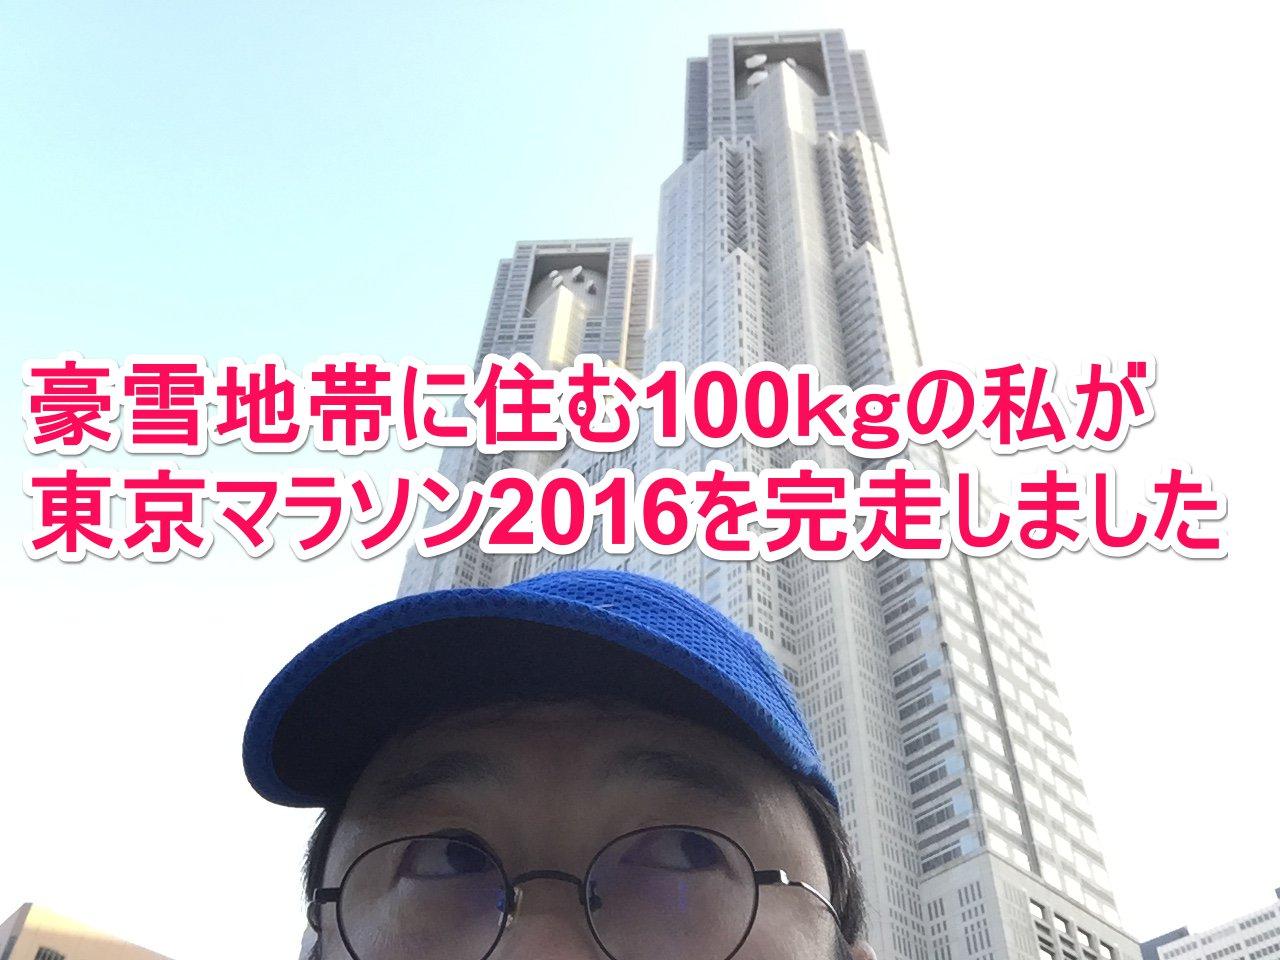 2016-02-28_07.13.47_030616_052558_PM